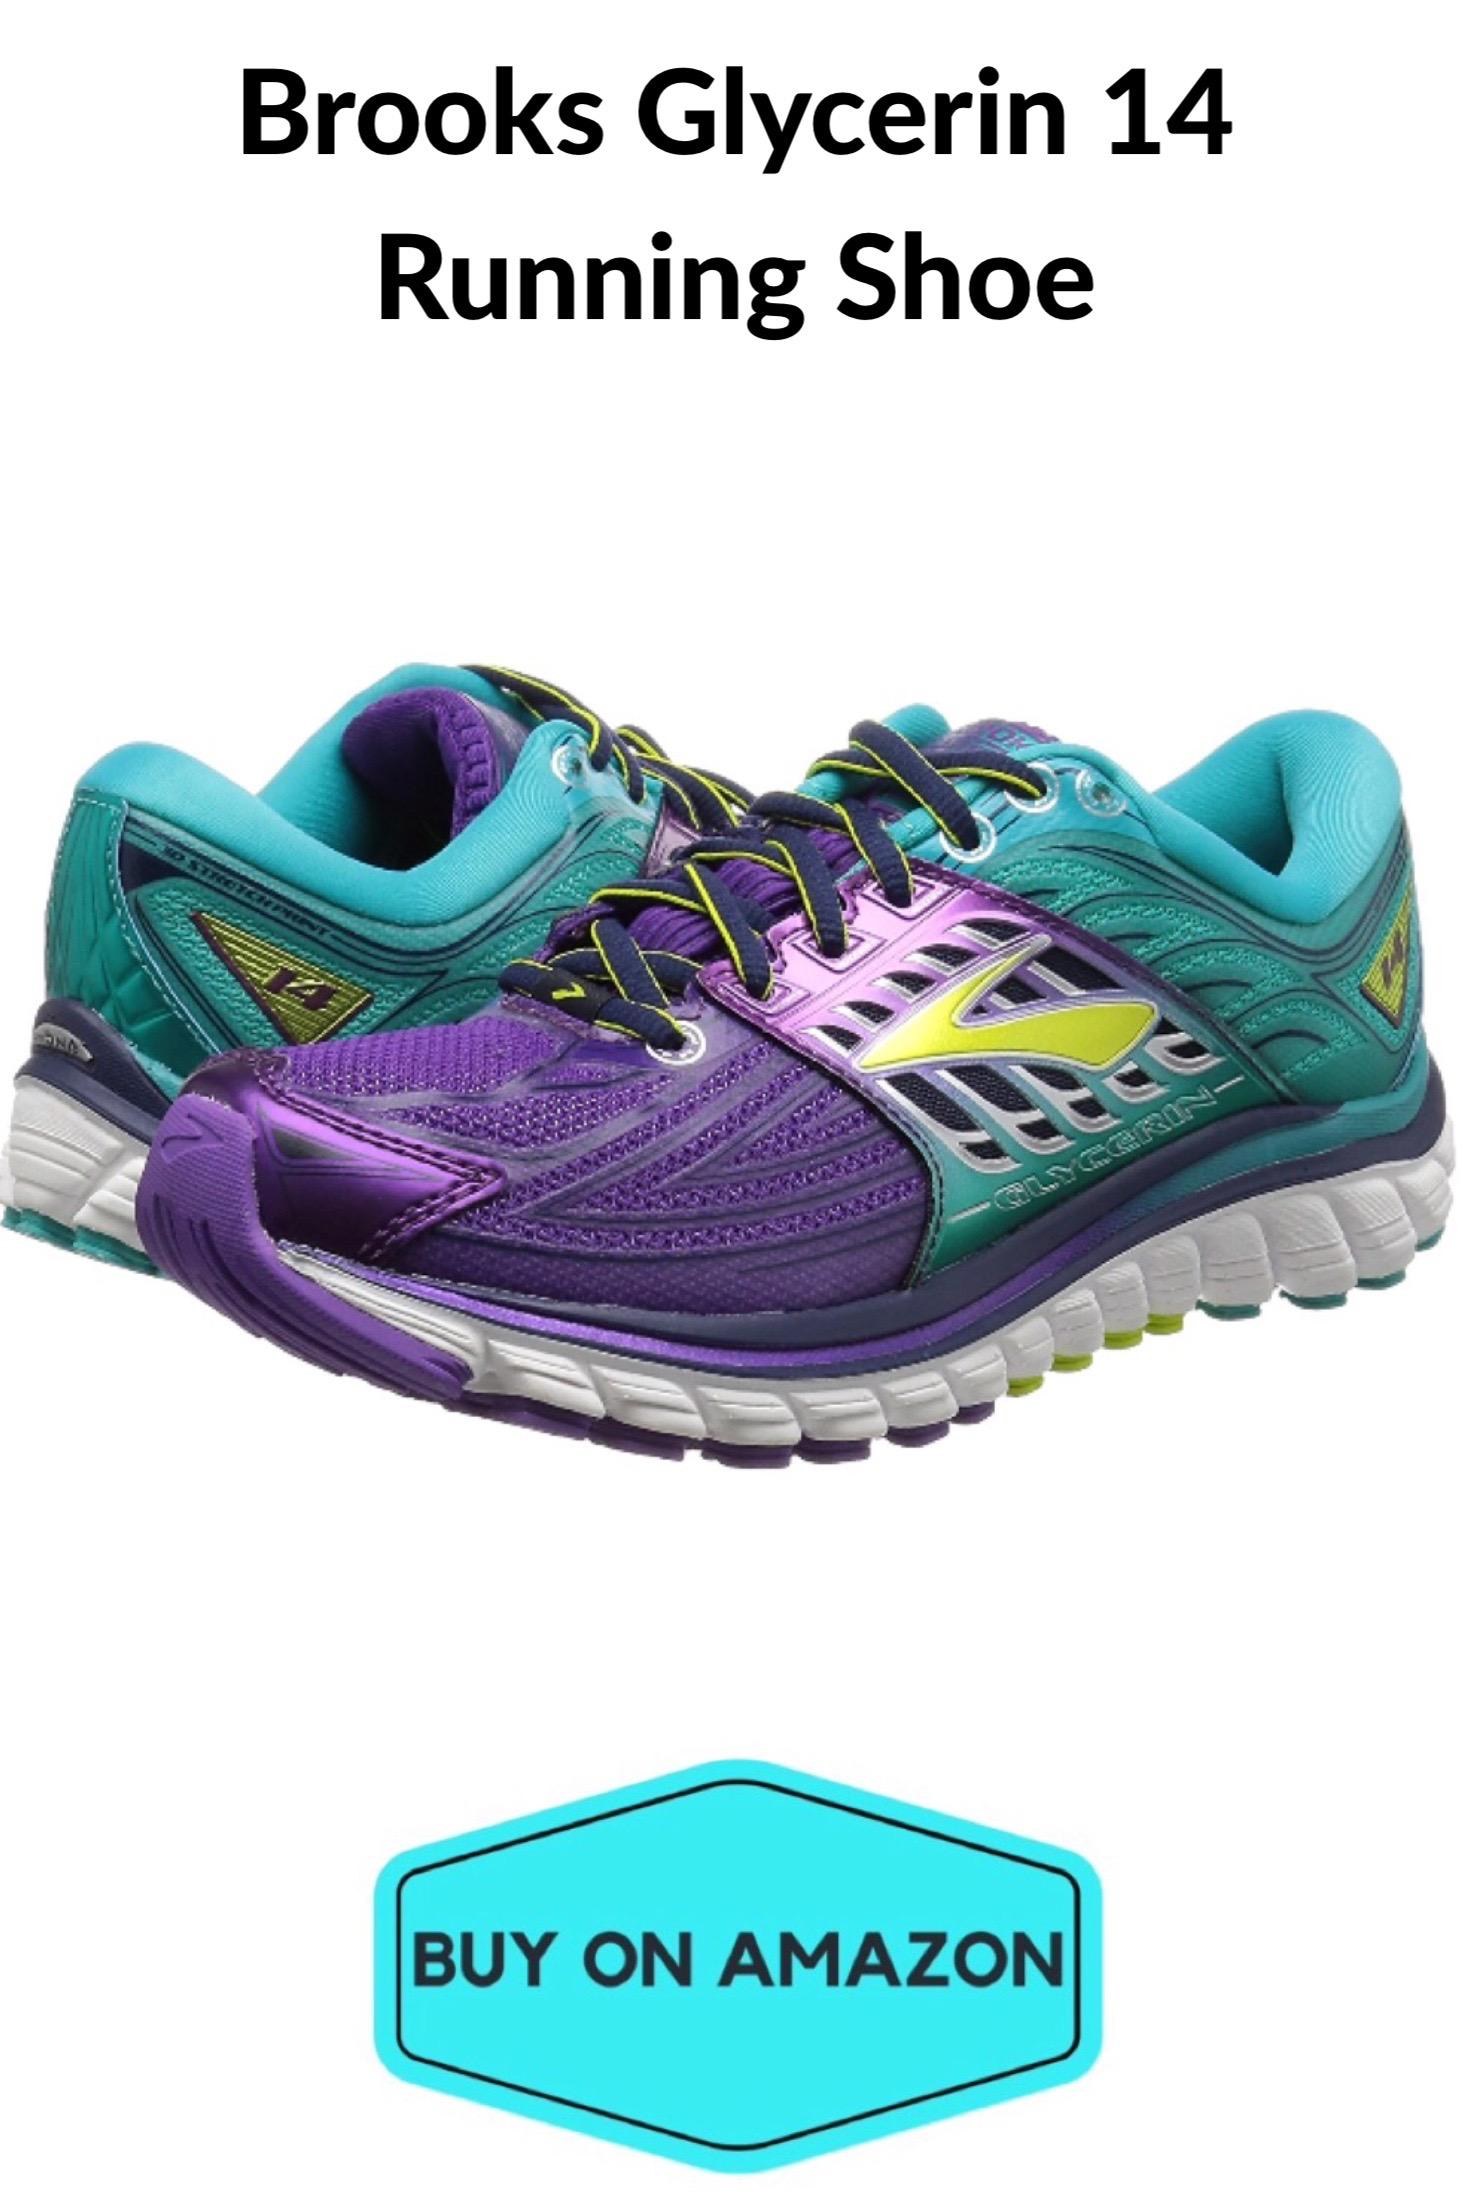 Brooks Glycerin 14 Women's Running Shoe